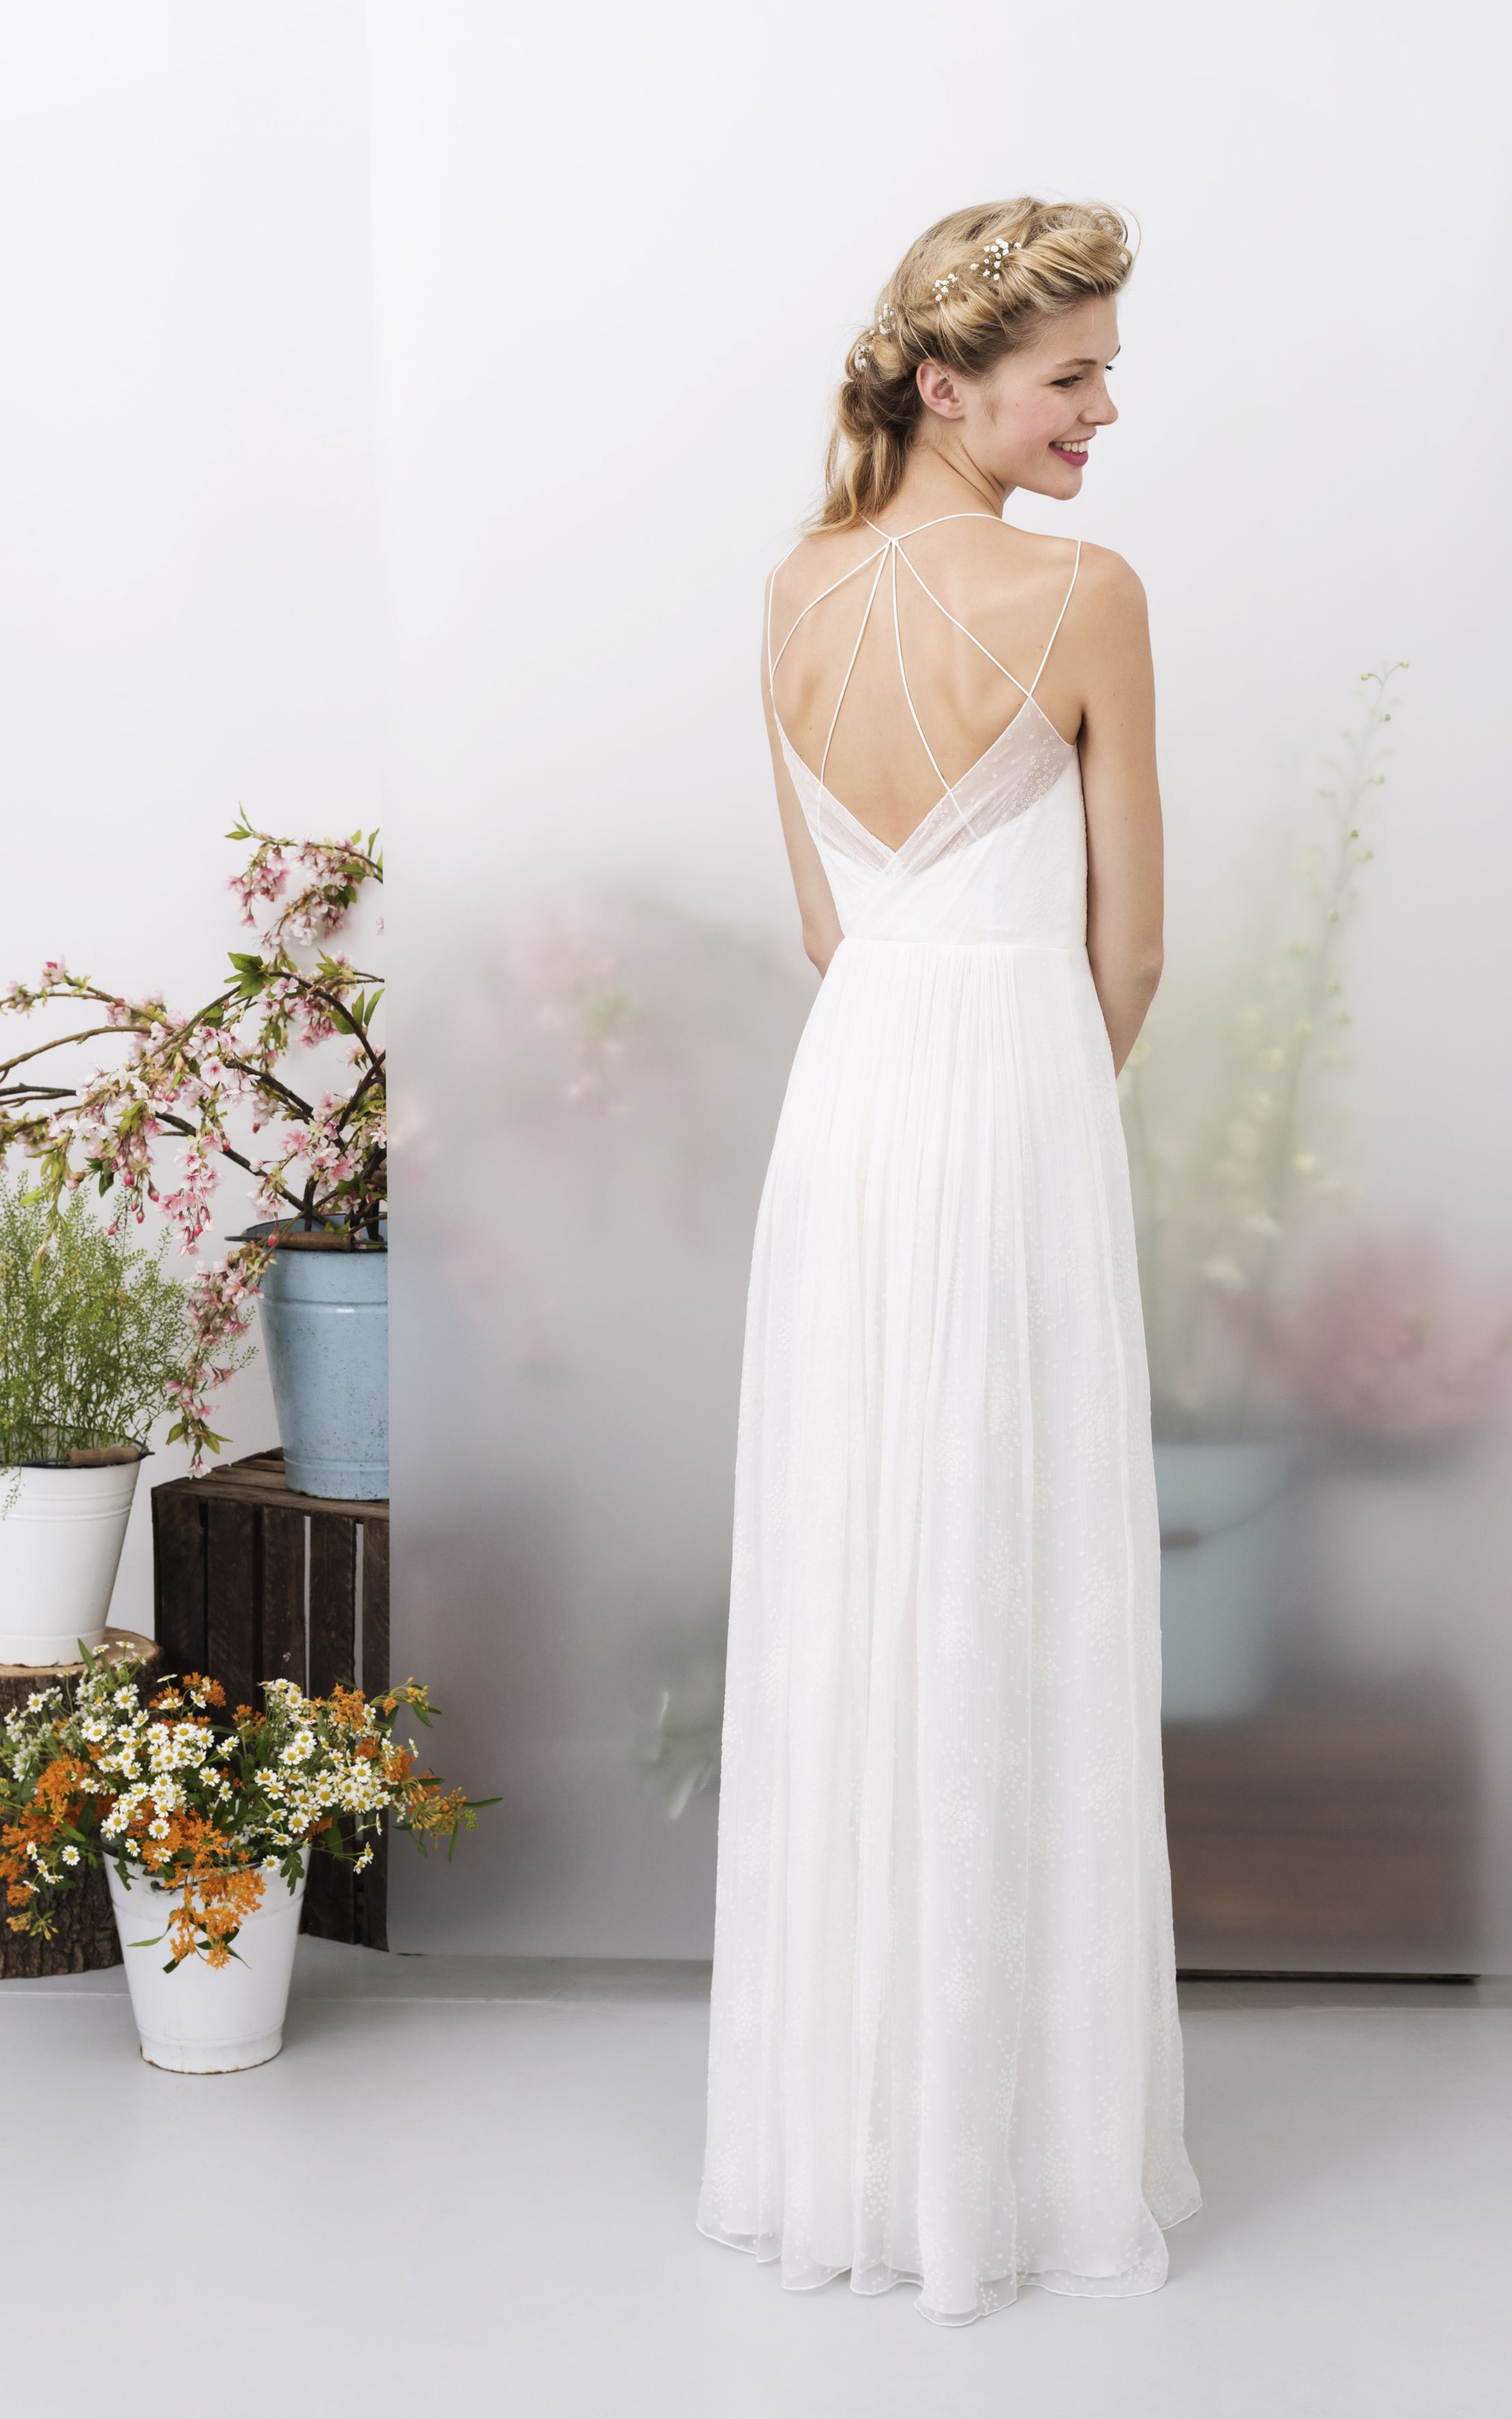 kisui OUI Collection Bridal Style: enny, Brautkleid, Weddingdress by ...